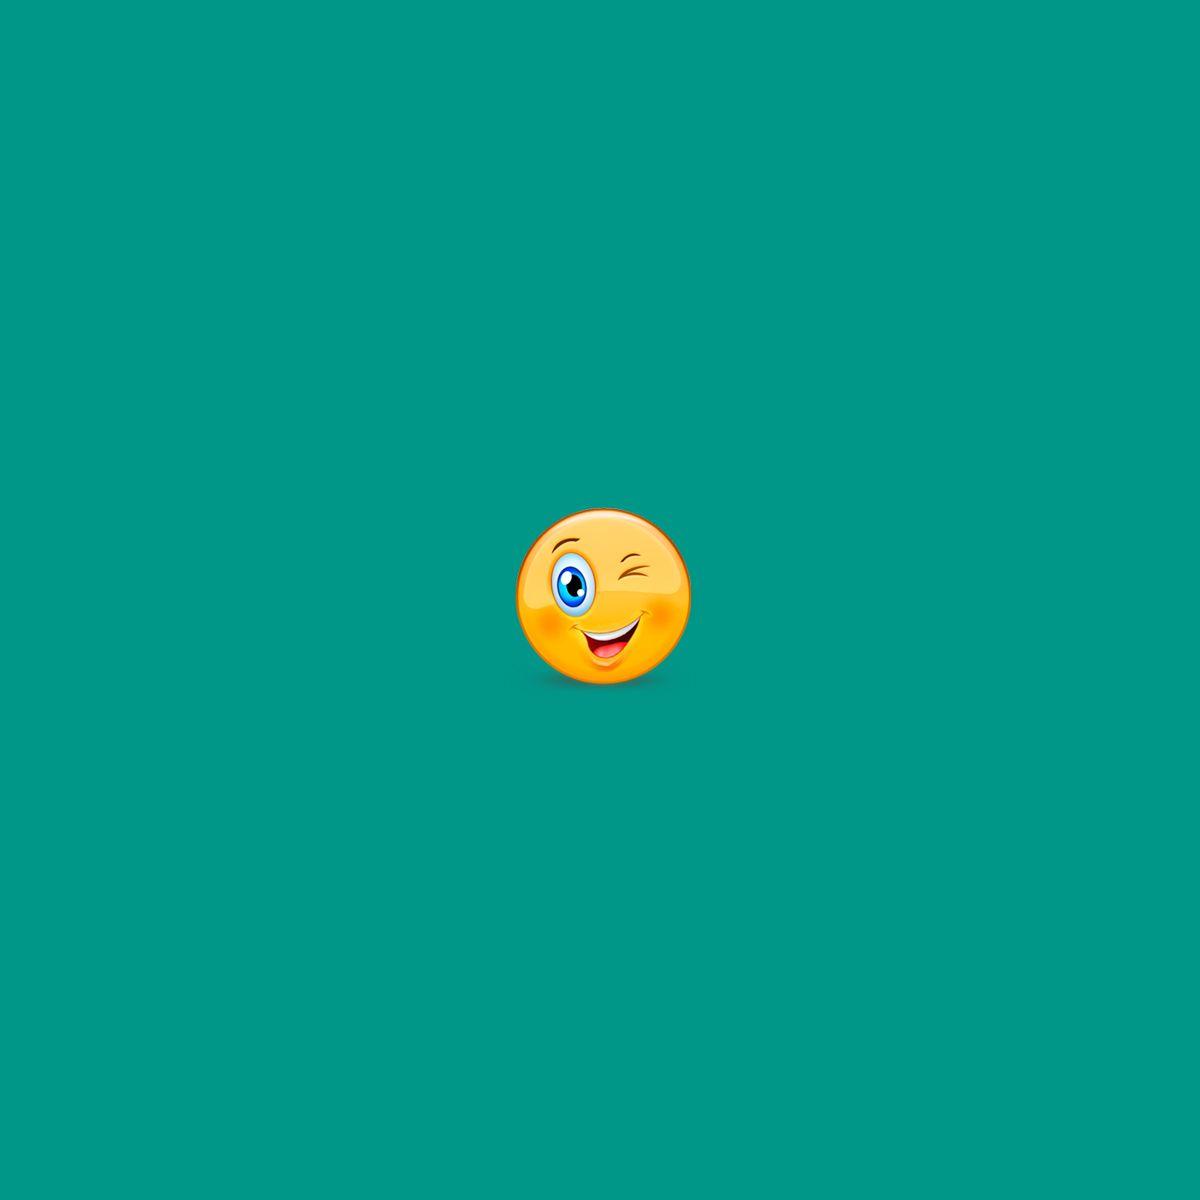 Adult Emojis No 31 Flirtyemojis Flirty Emojis Pinterest